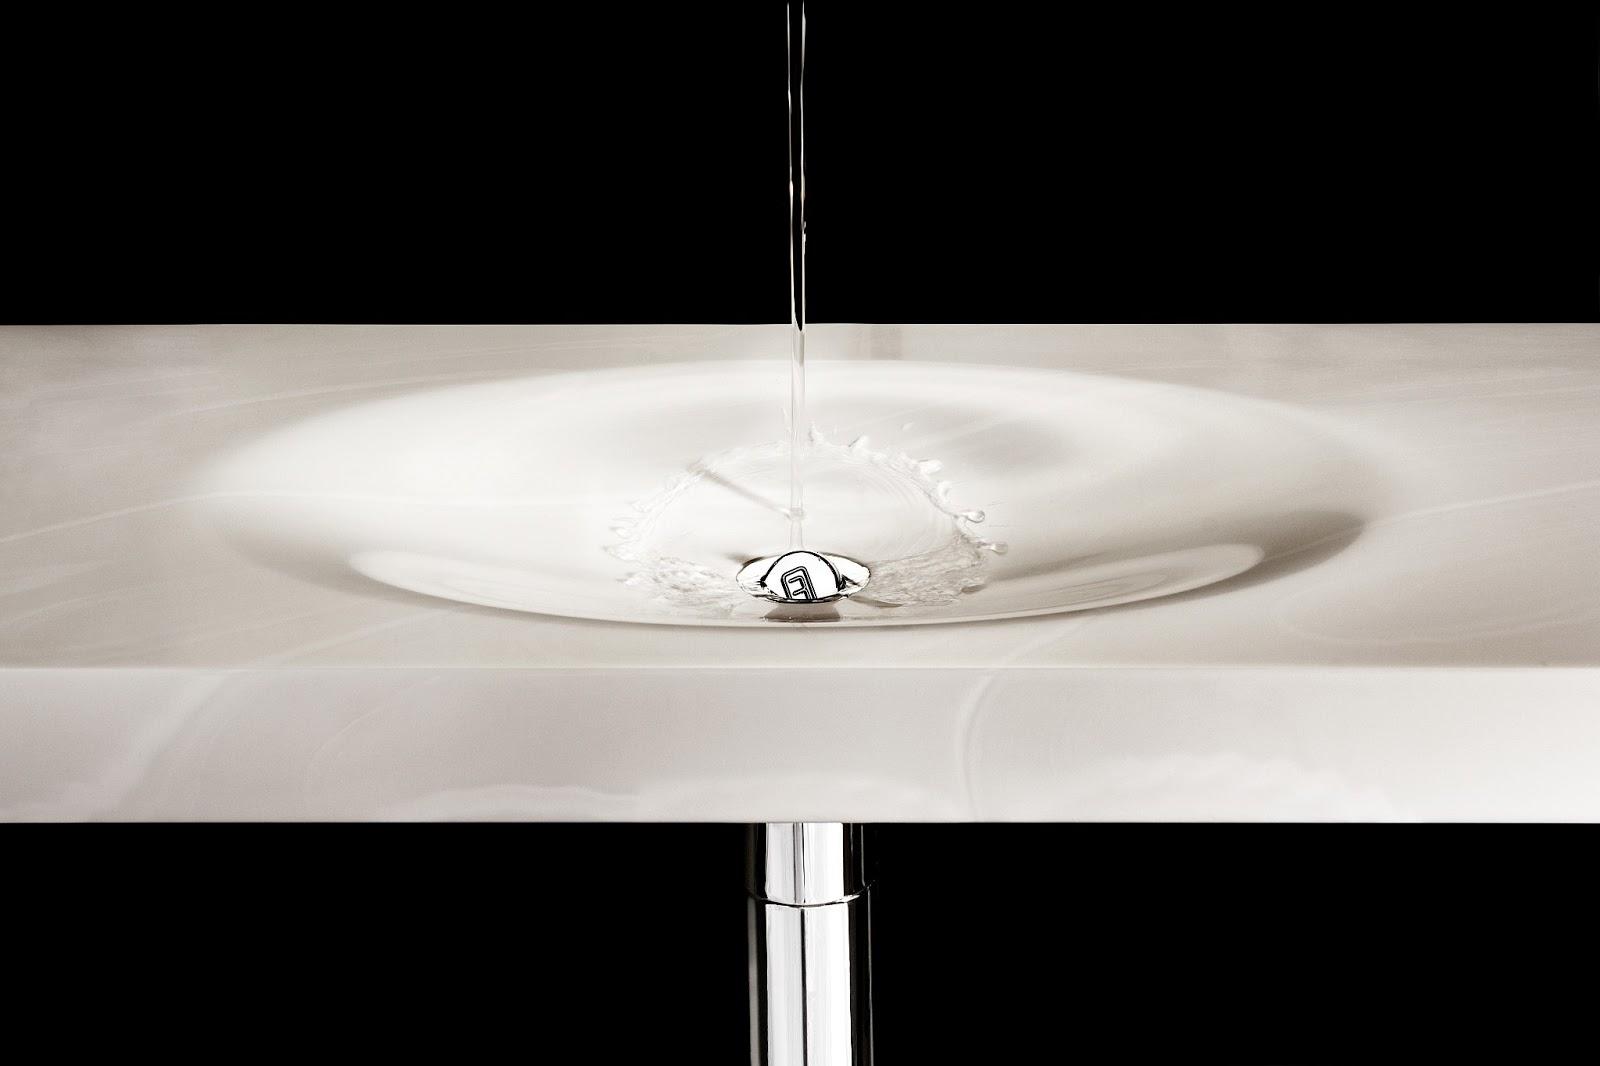 Minosa ScoopED washbasin by Minosa integrated bathroom basin  bench